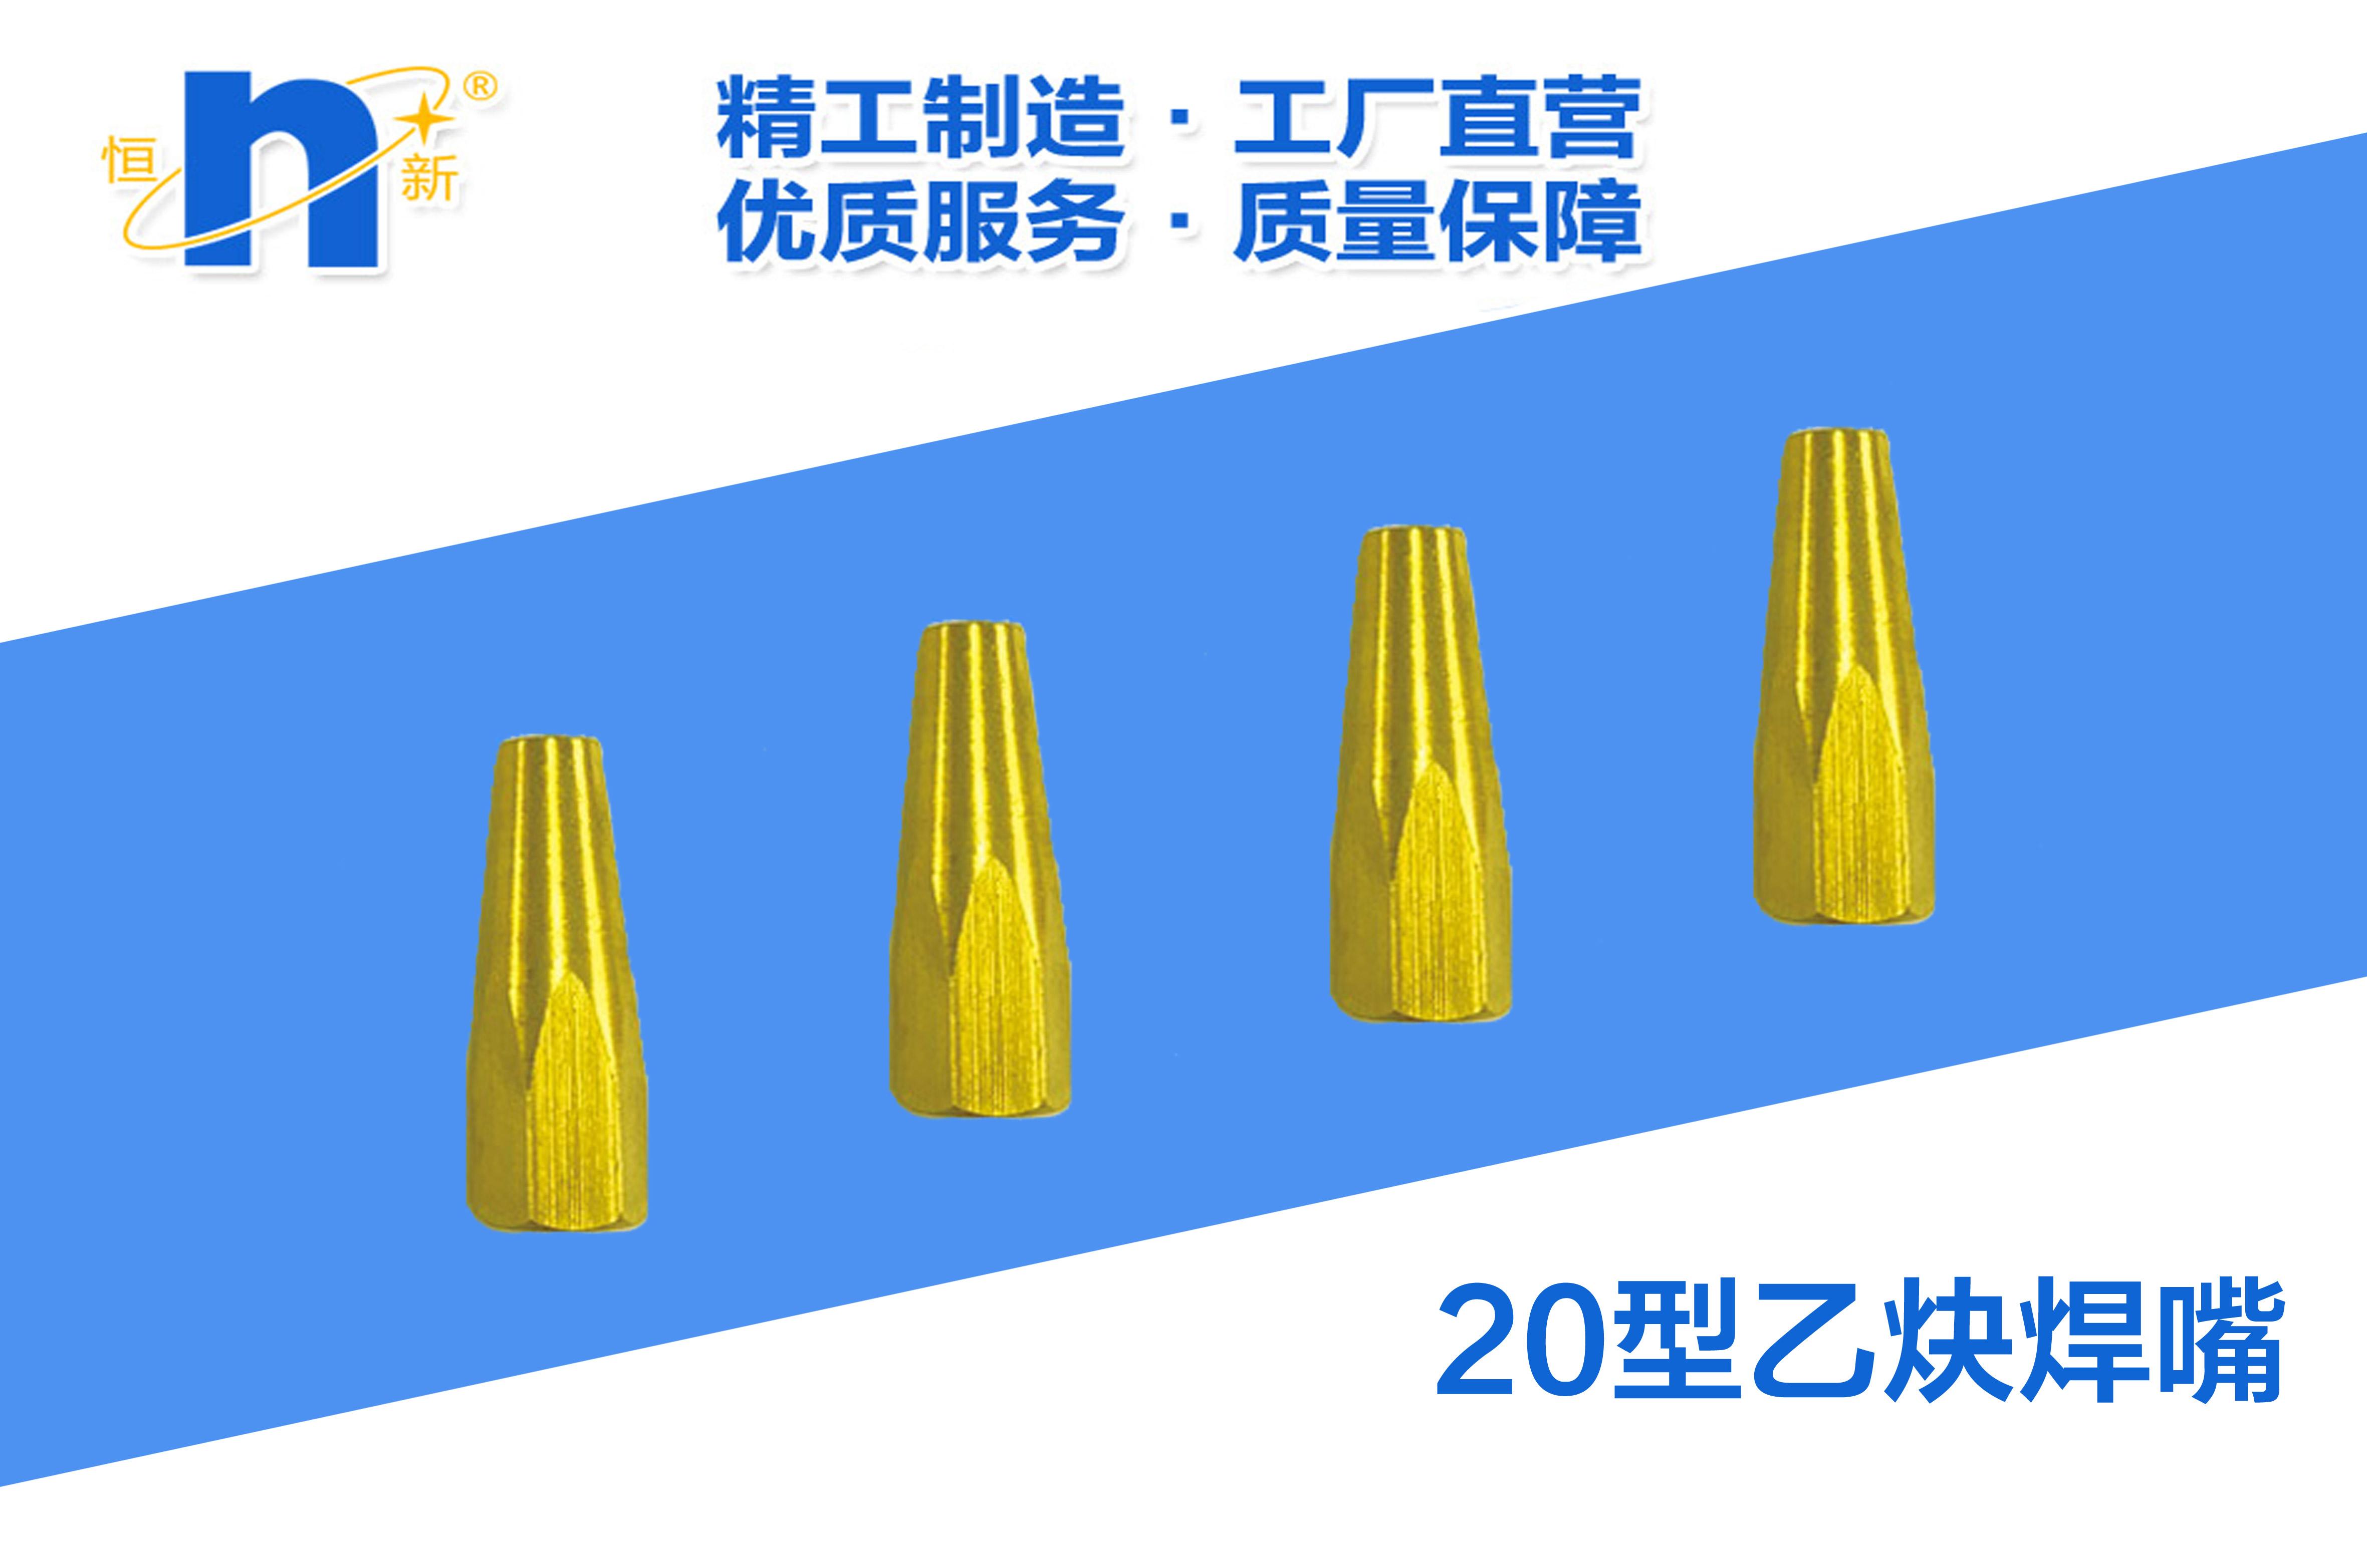 20型乙炔焊嘴